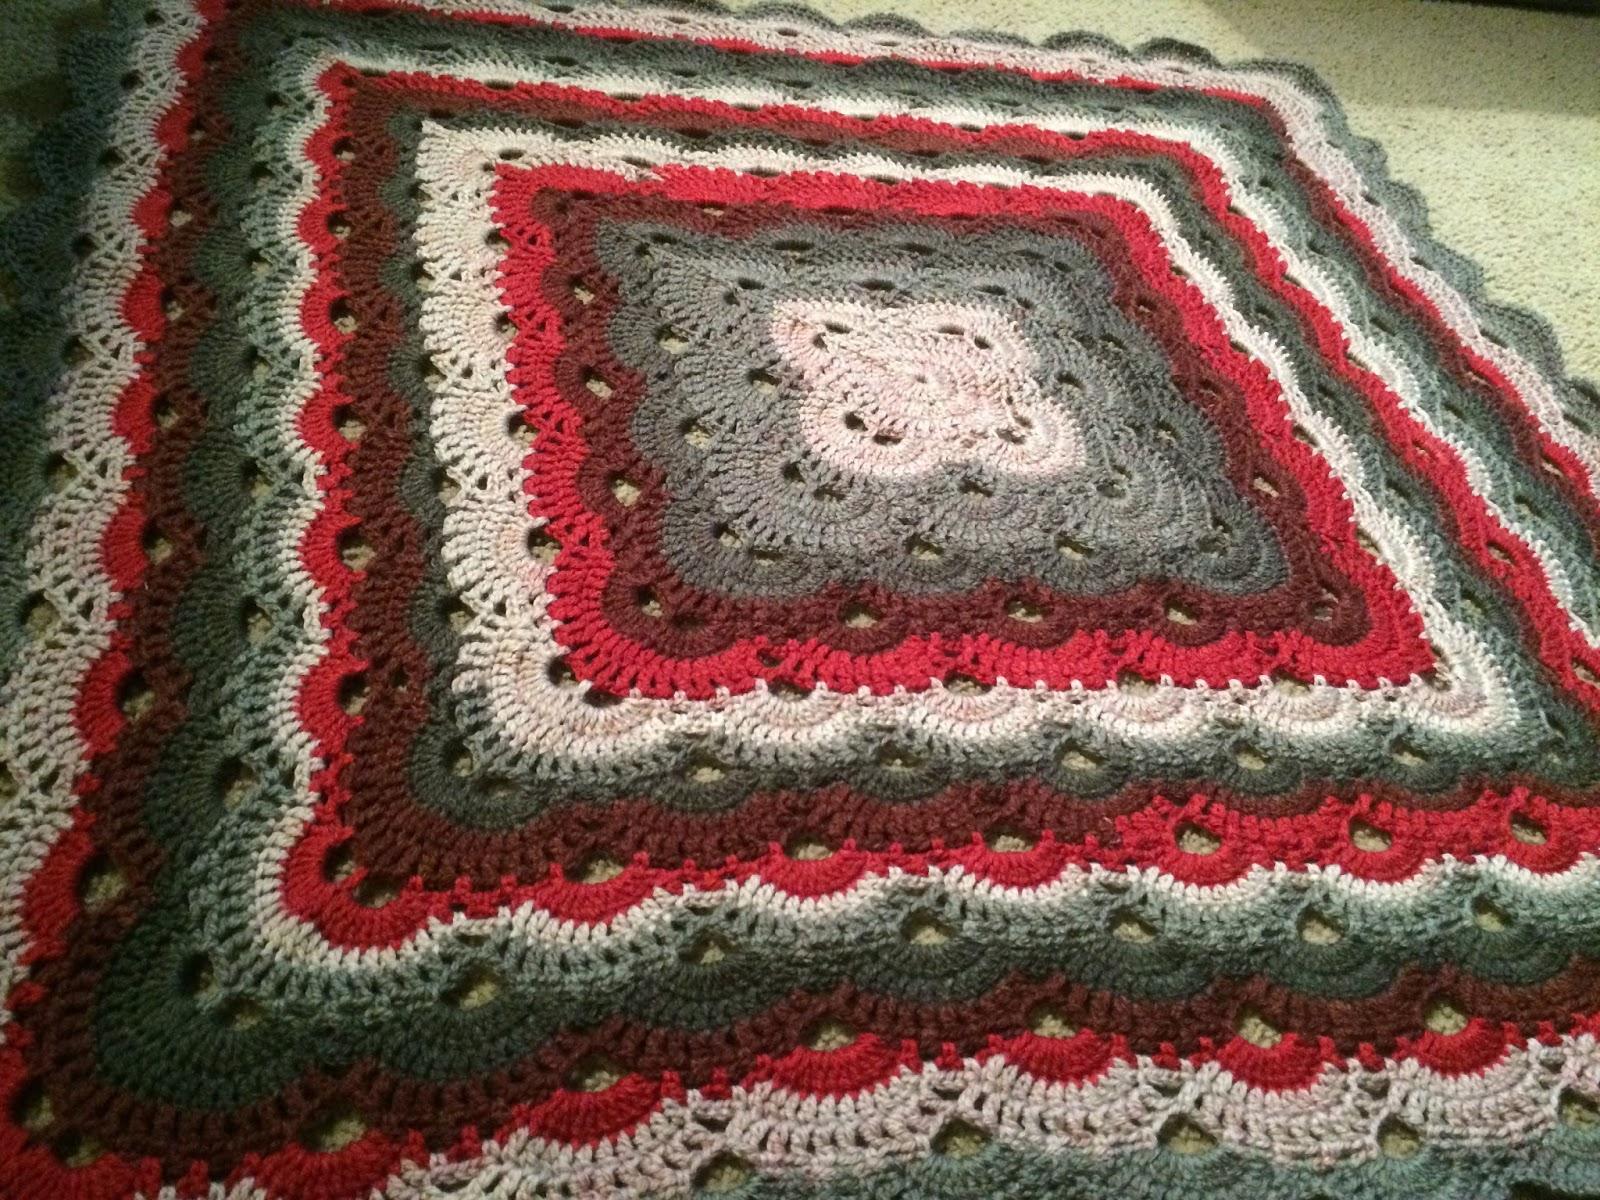 Crochet Baby Blanket Caron Cakes